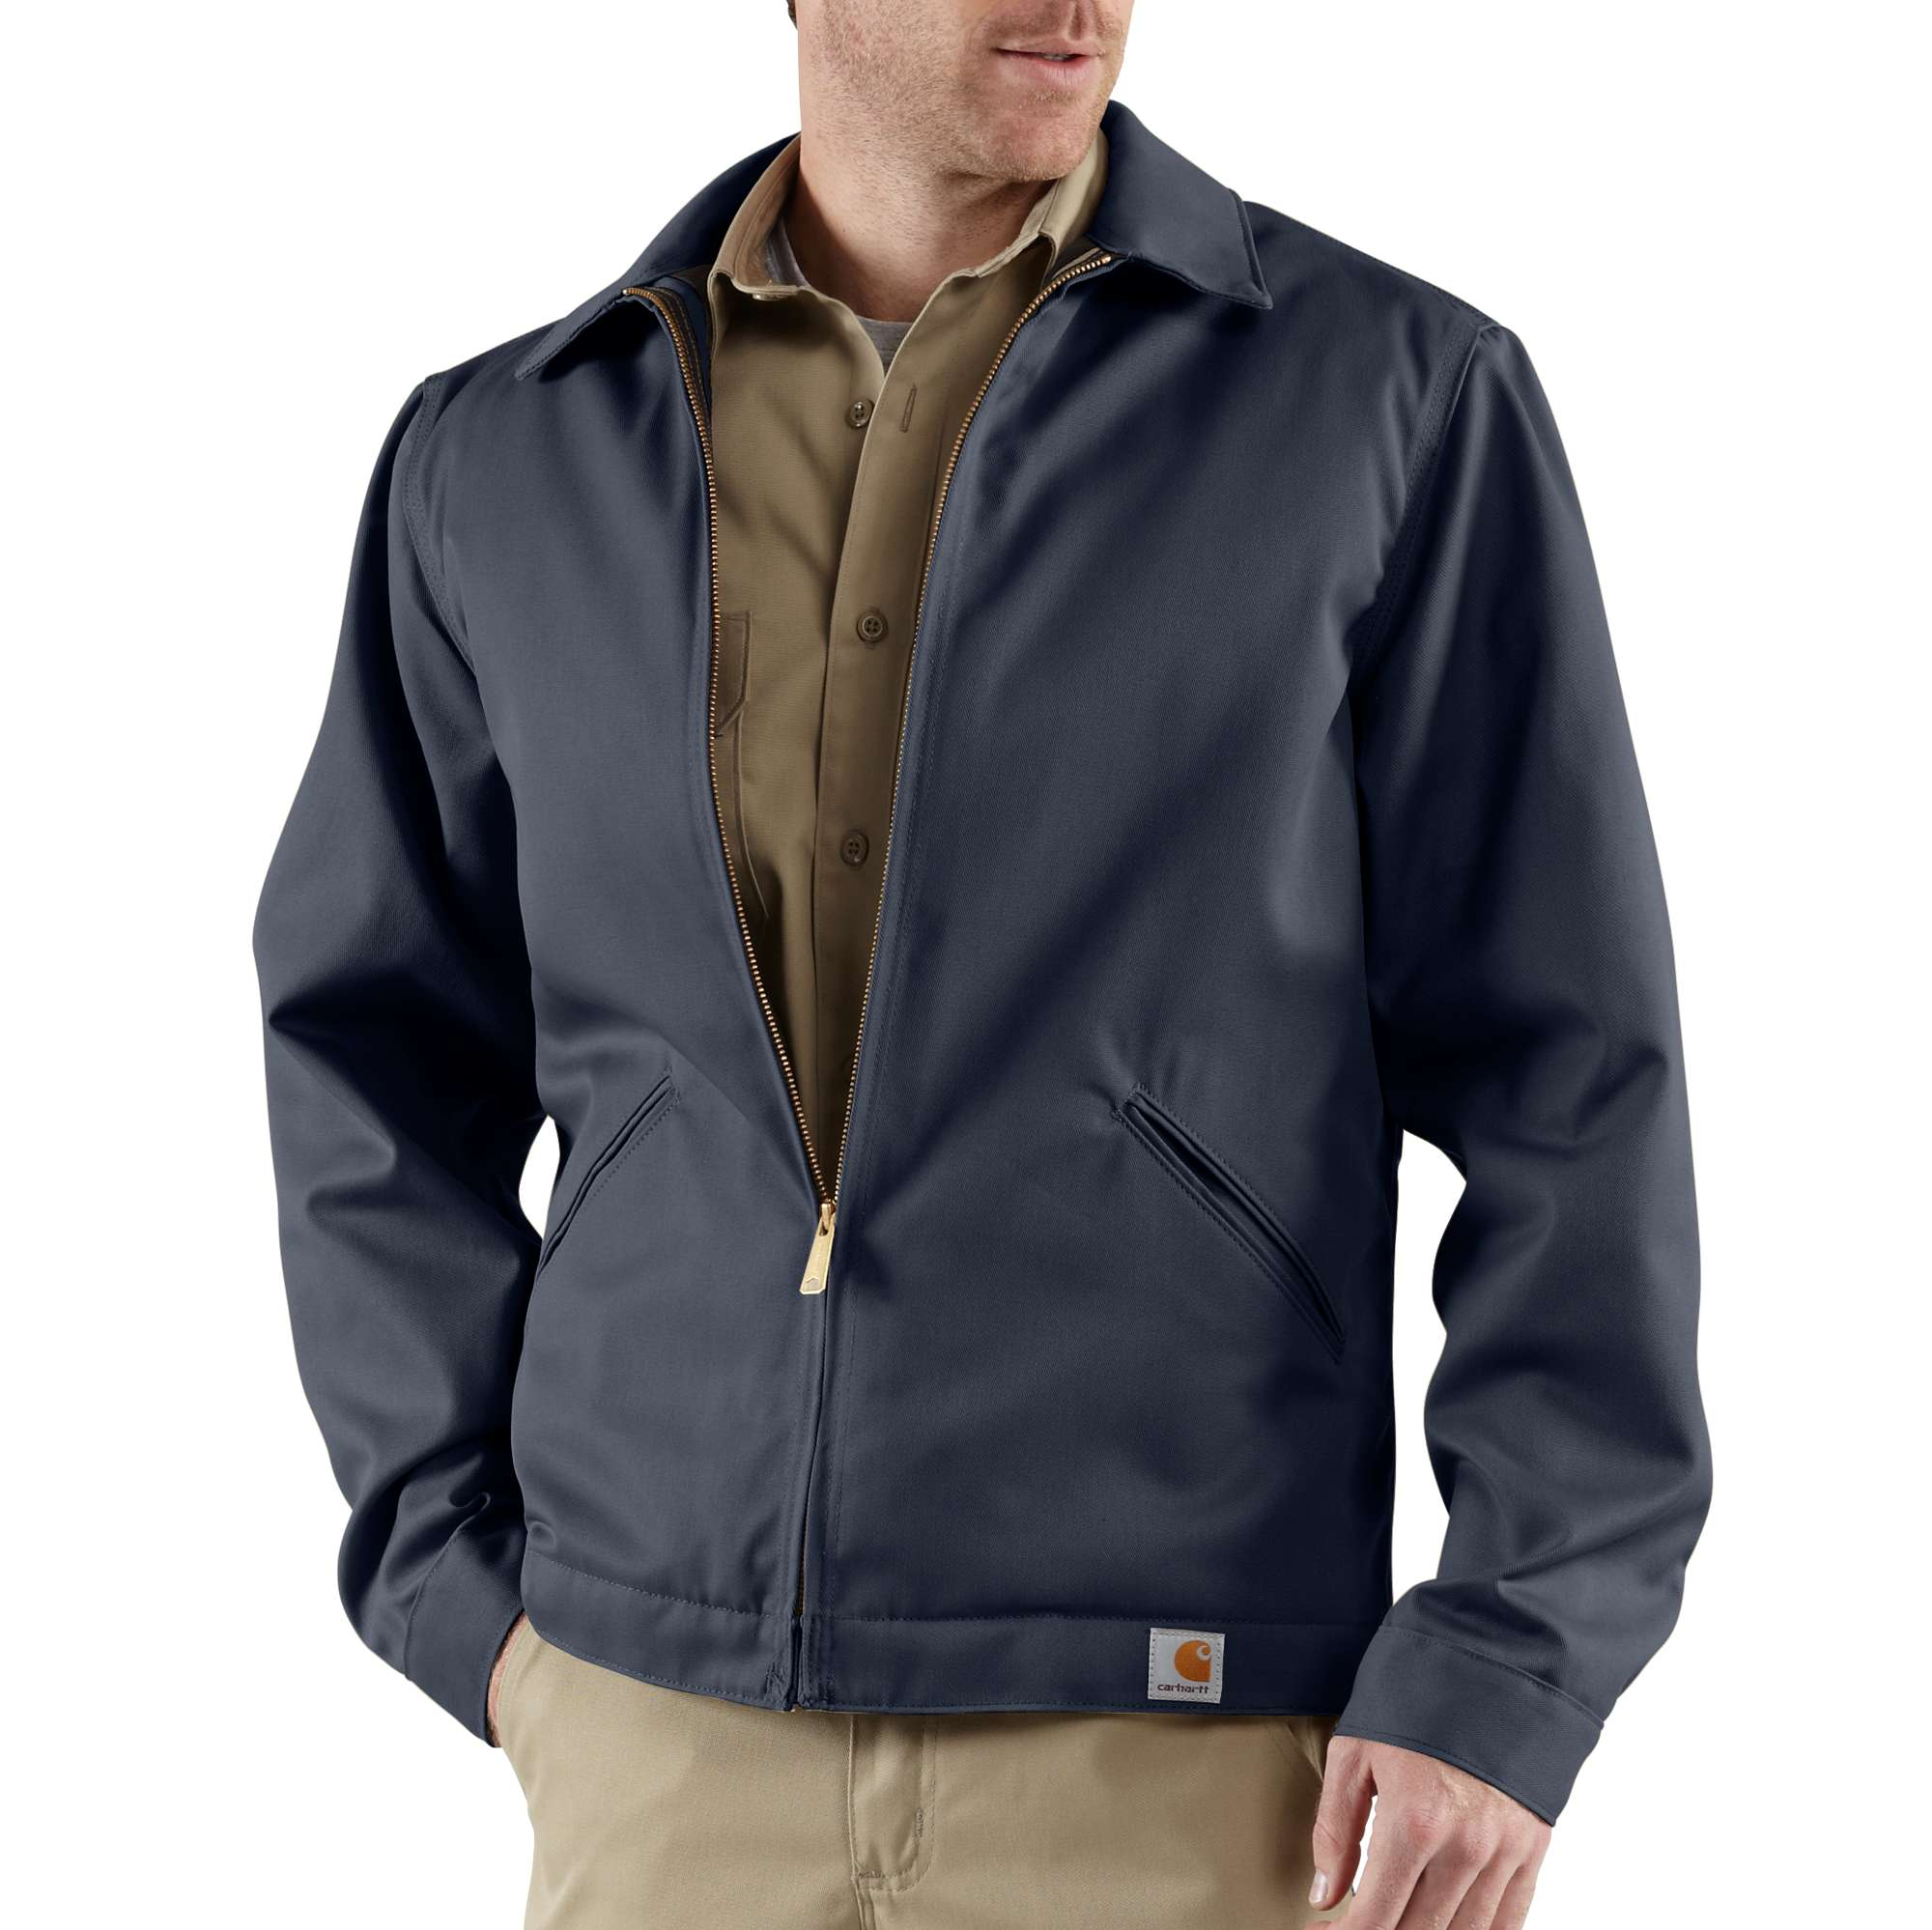 Carhartt Twill Work Jacket/Midweight Quilt Lined